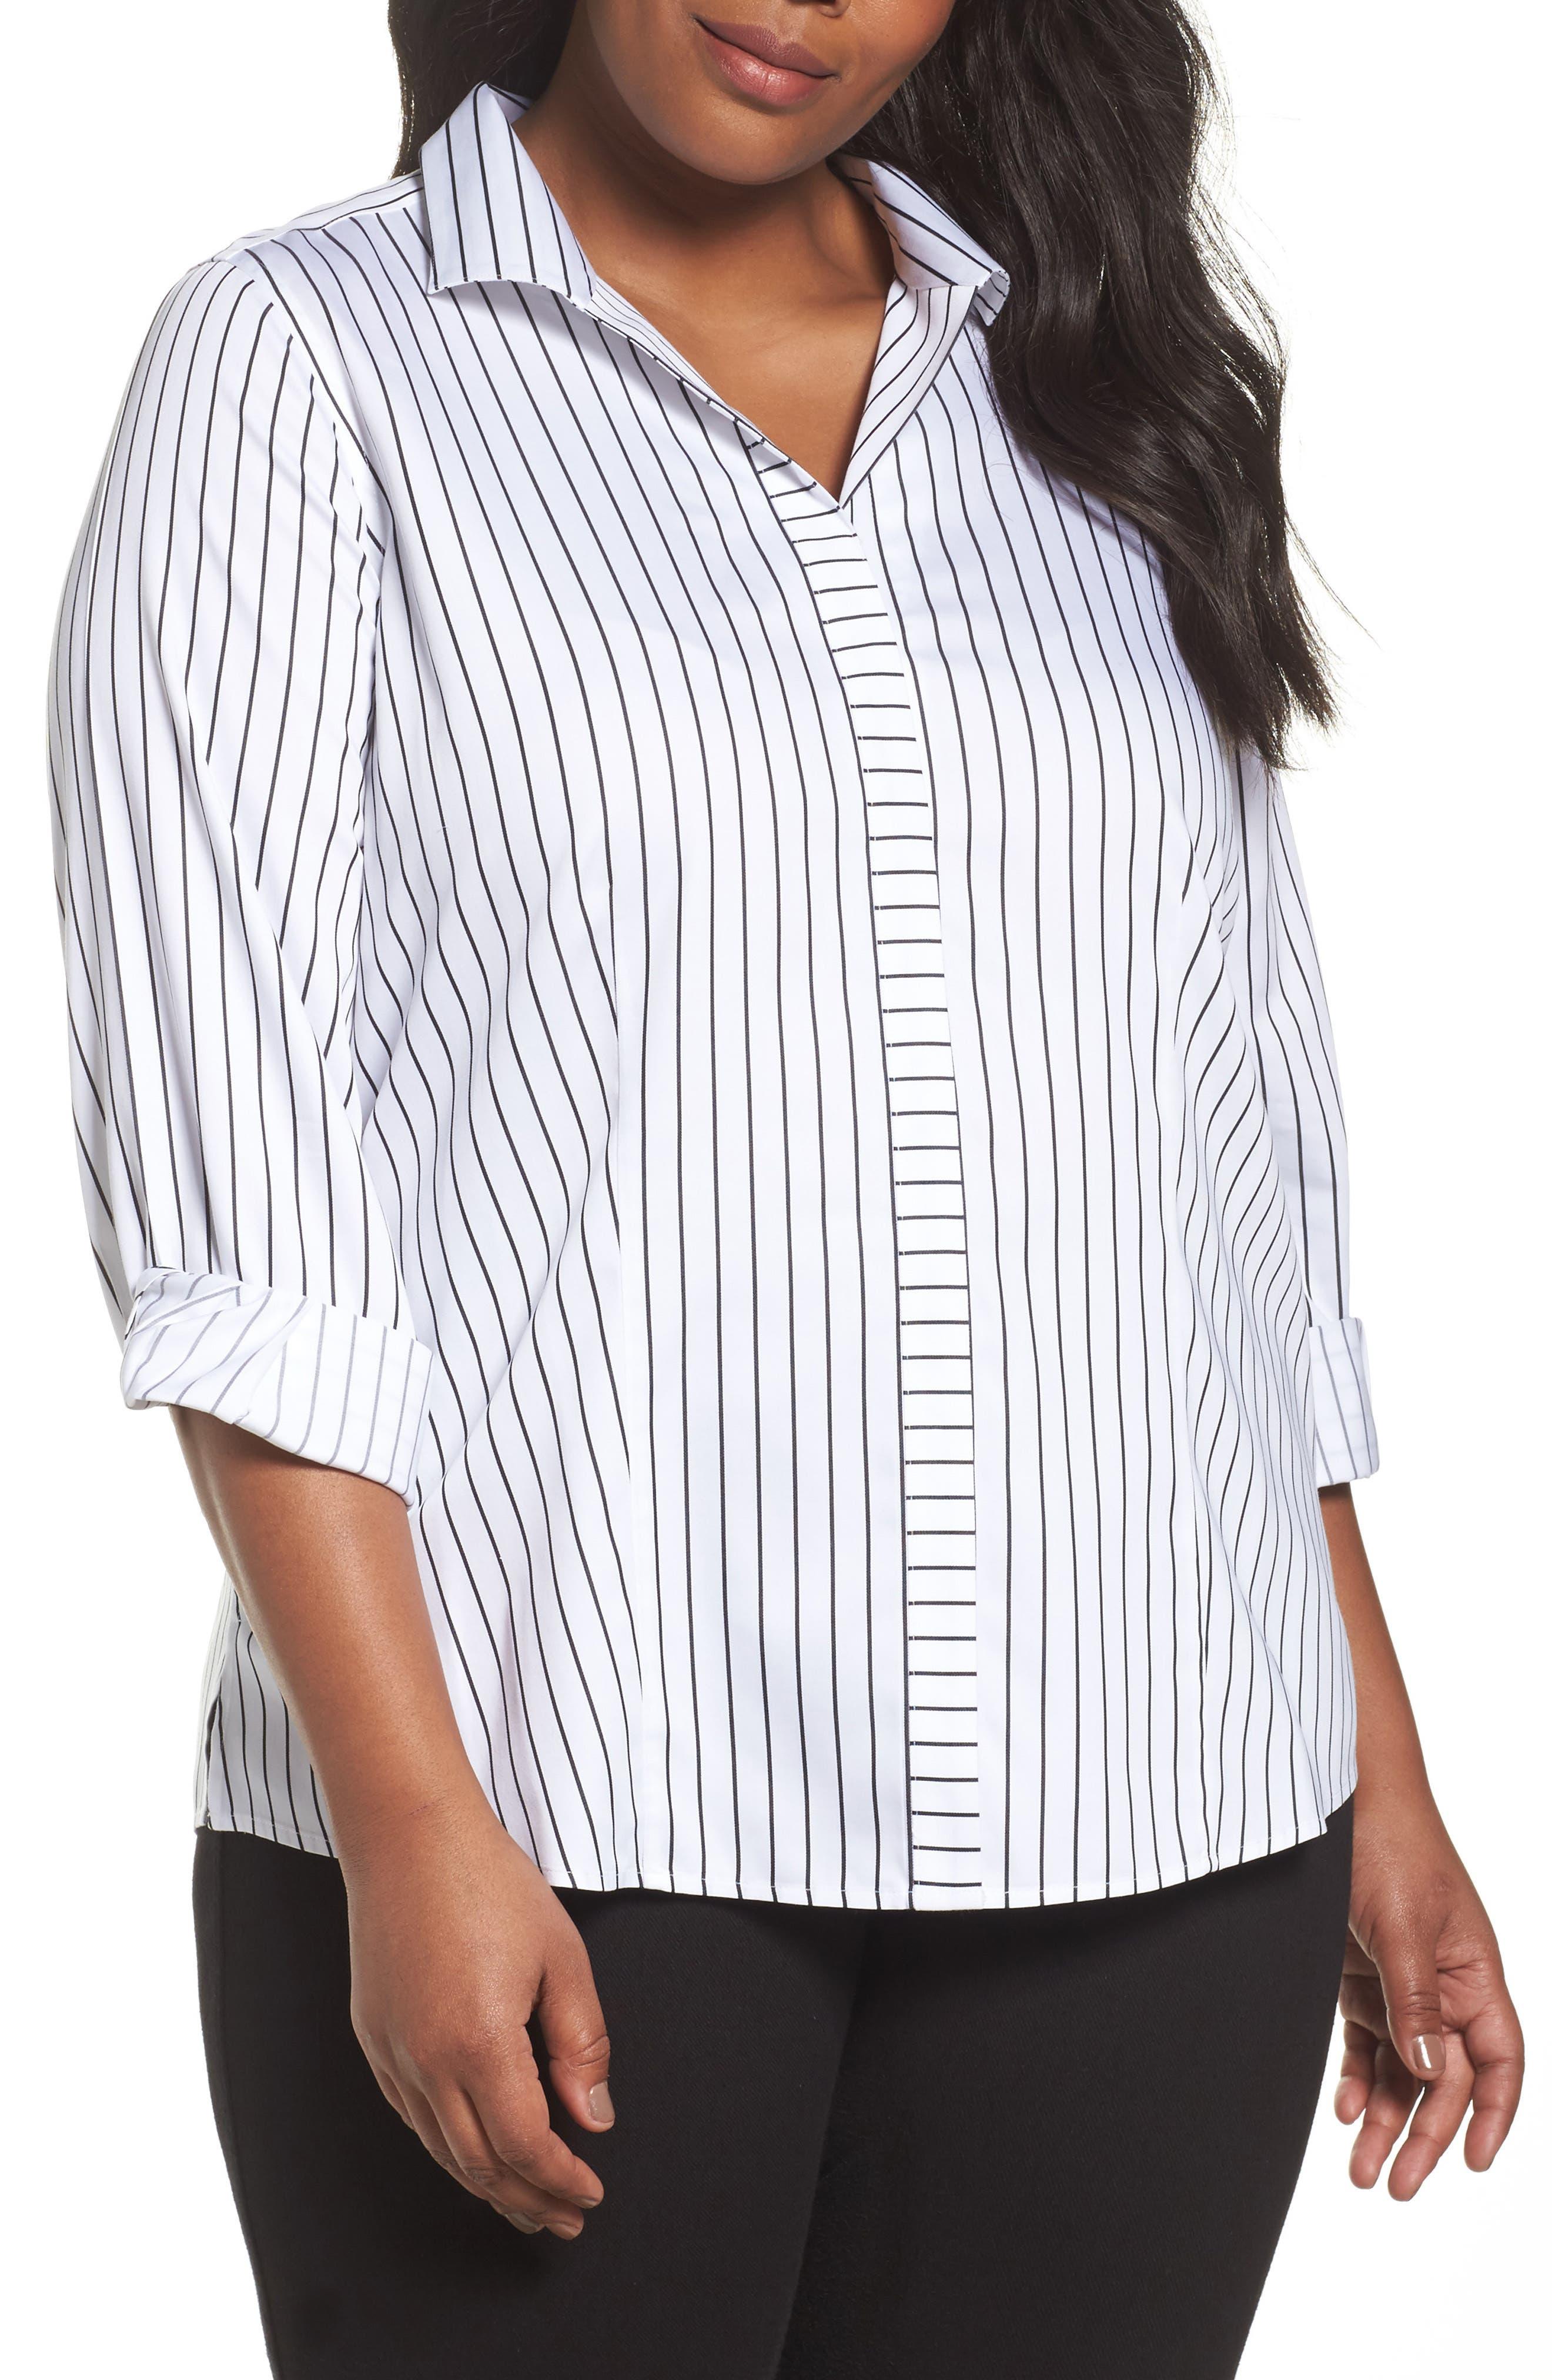 Annie Holiday Stripe Shirt,                             Main thumbnail 1, color,                             100